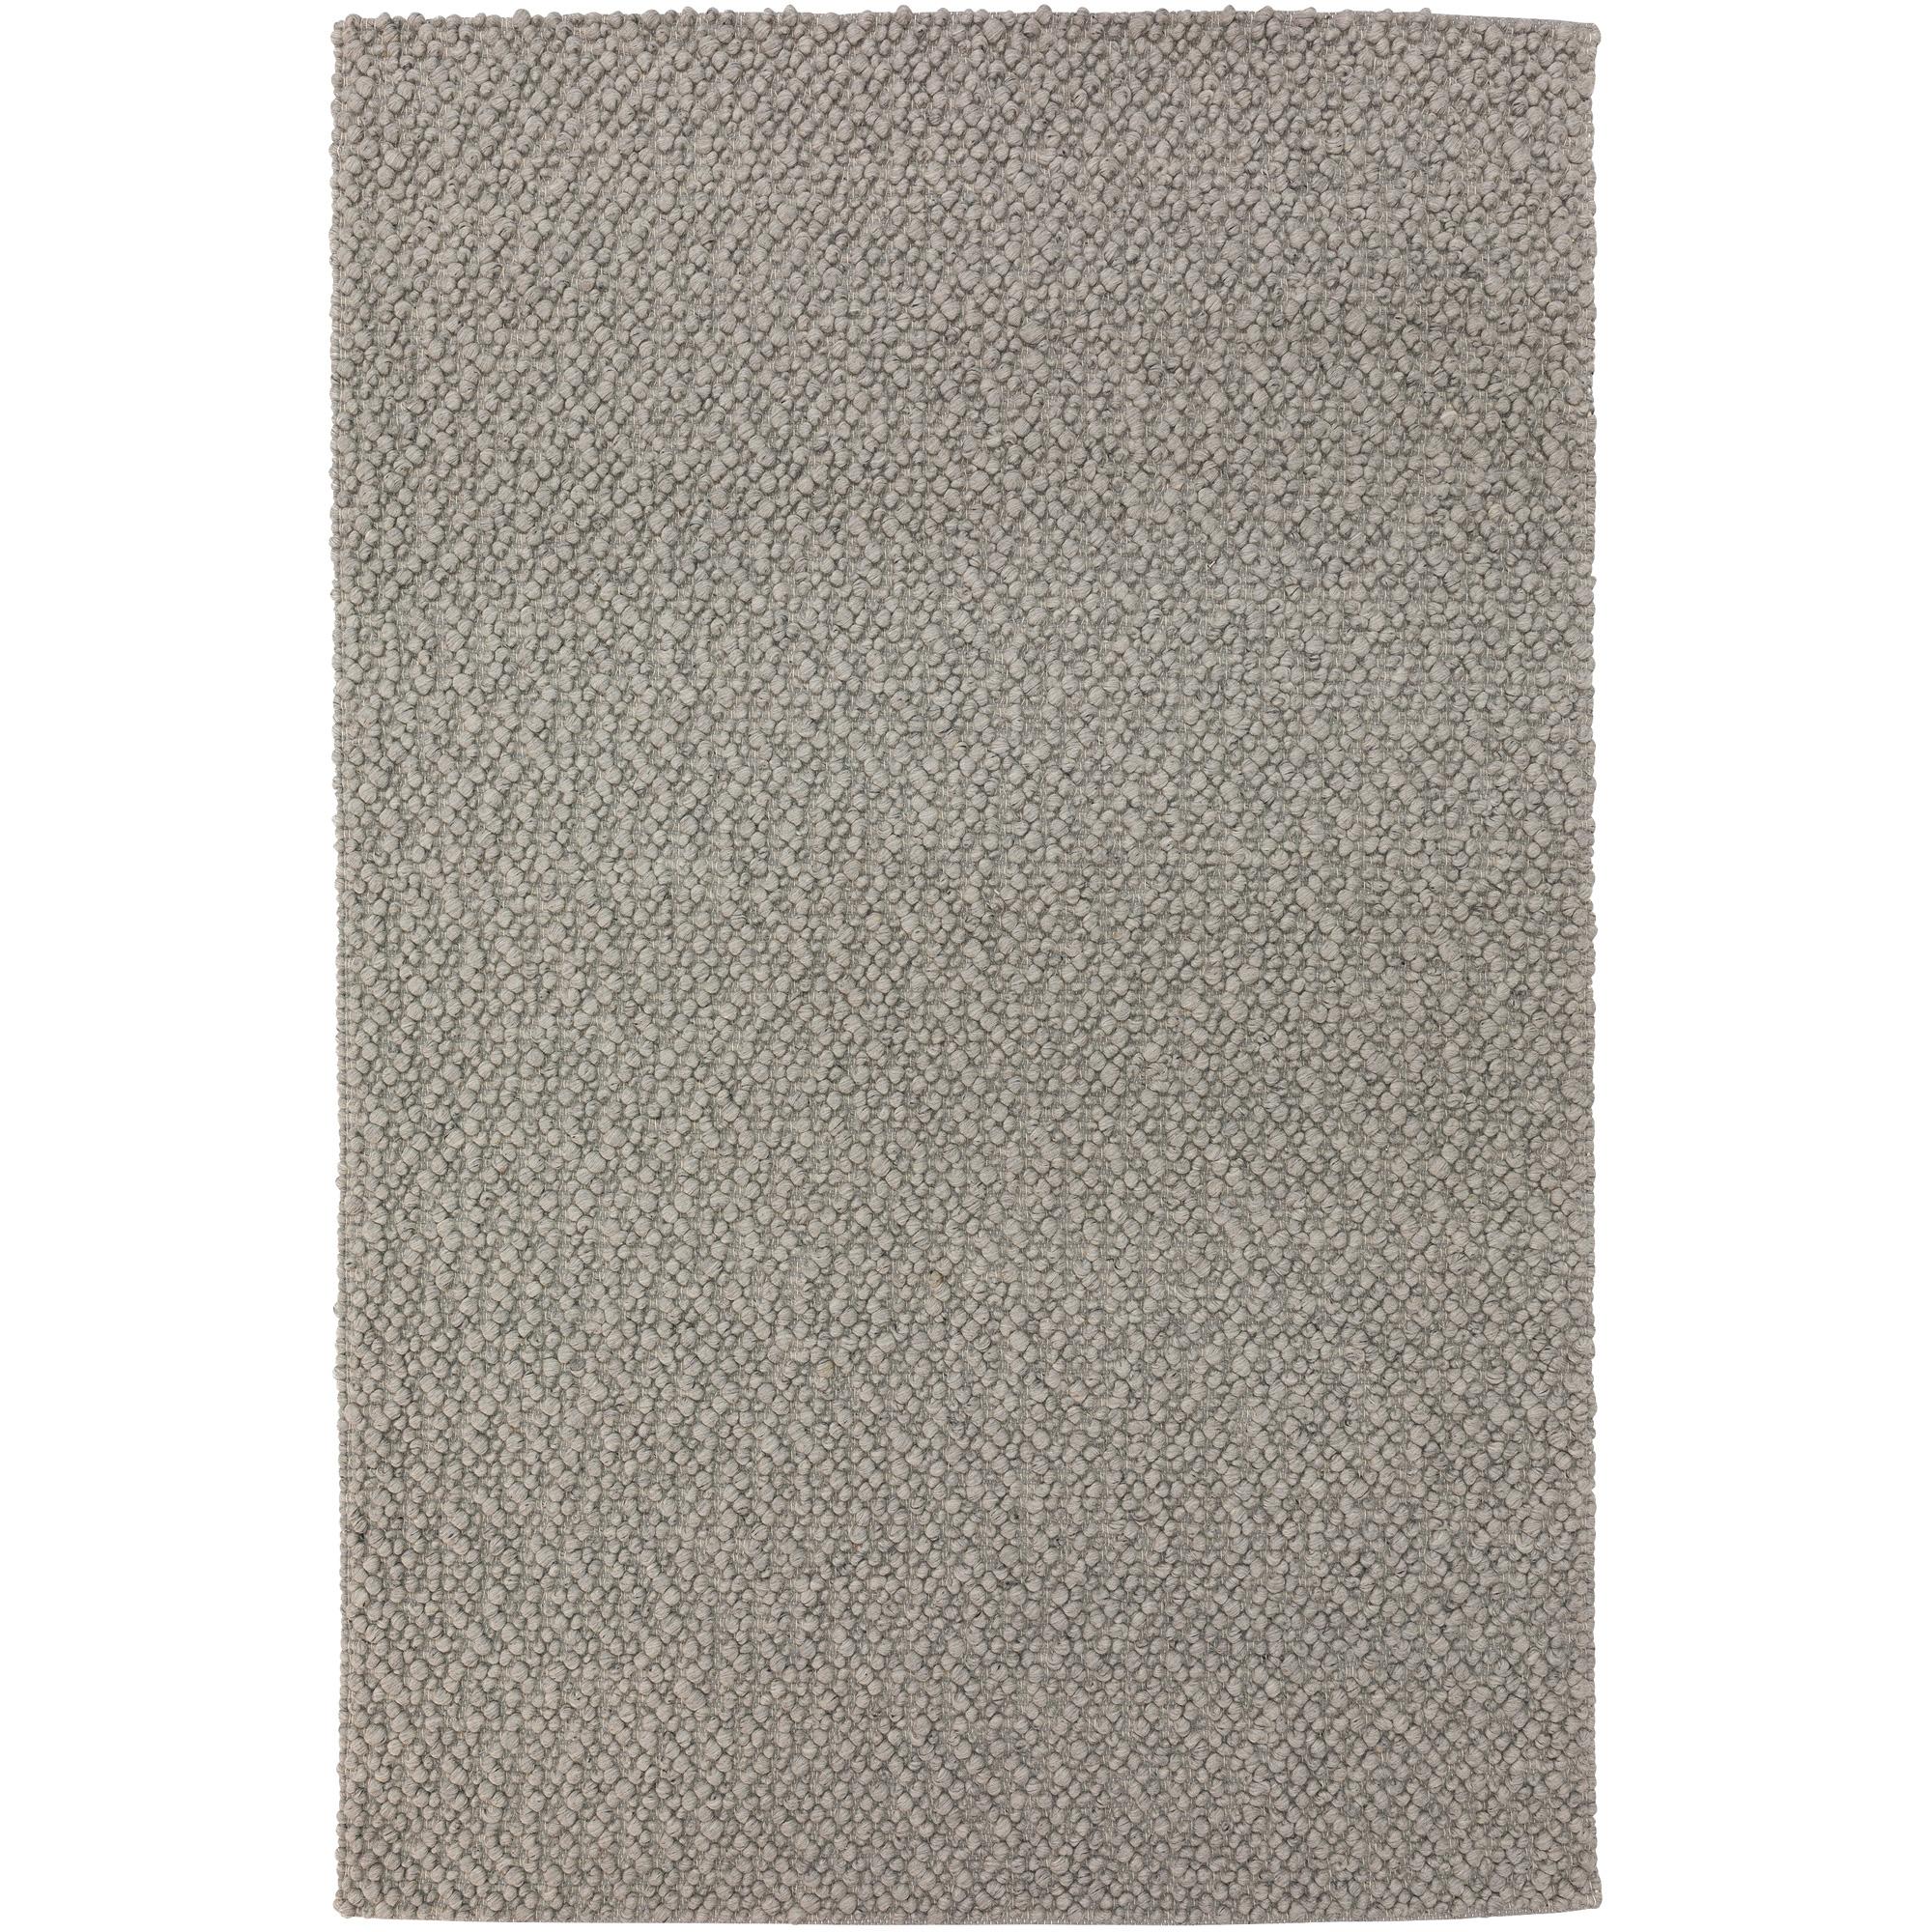 Dalyn Rug Company | Gorbea Silver 5x8 Area Rug